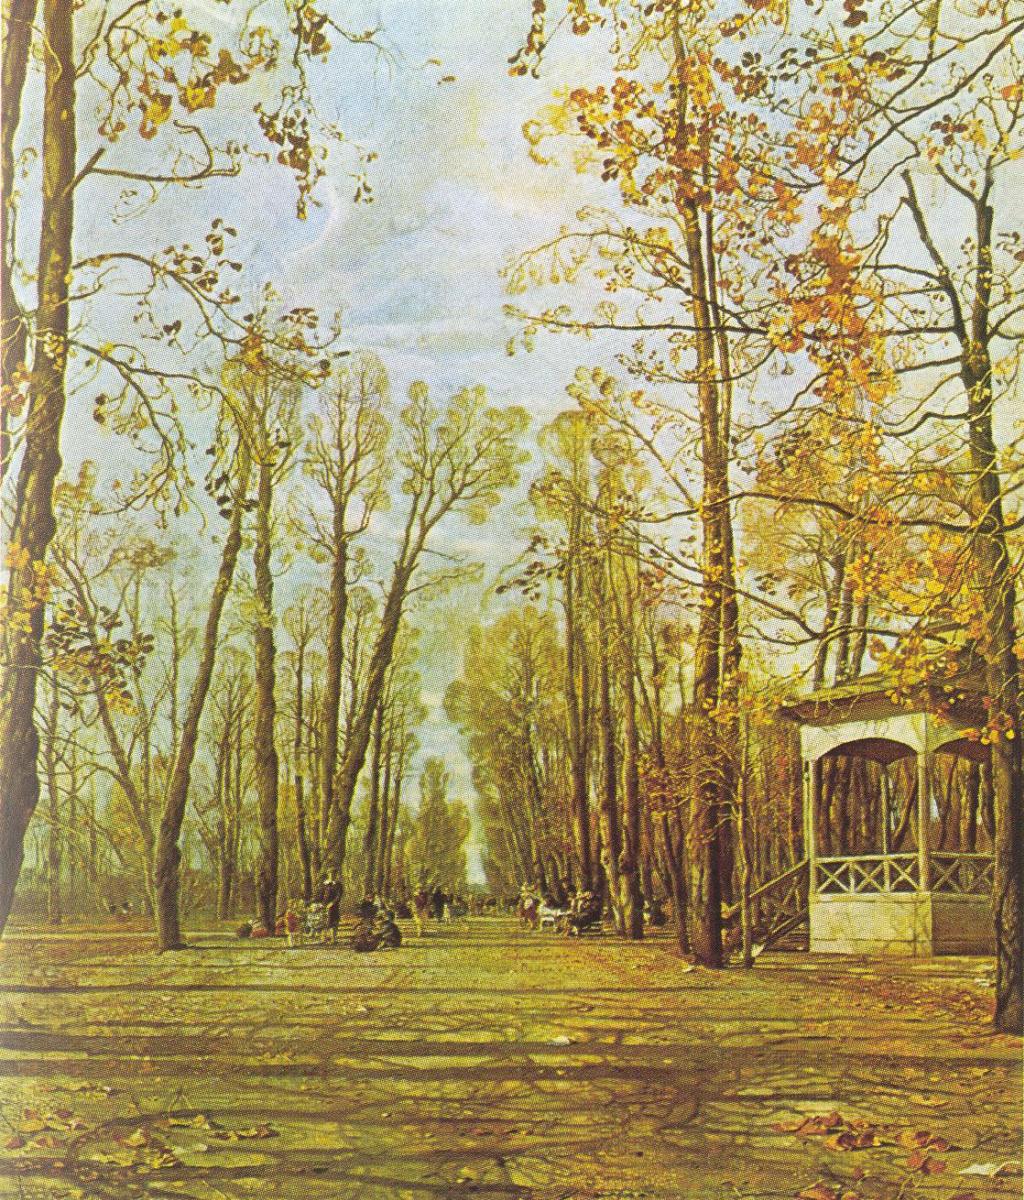 Isaac Brodsky. Summer Garden alley in autumn